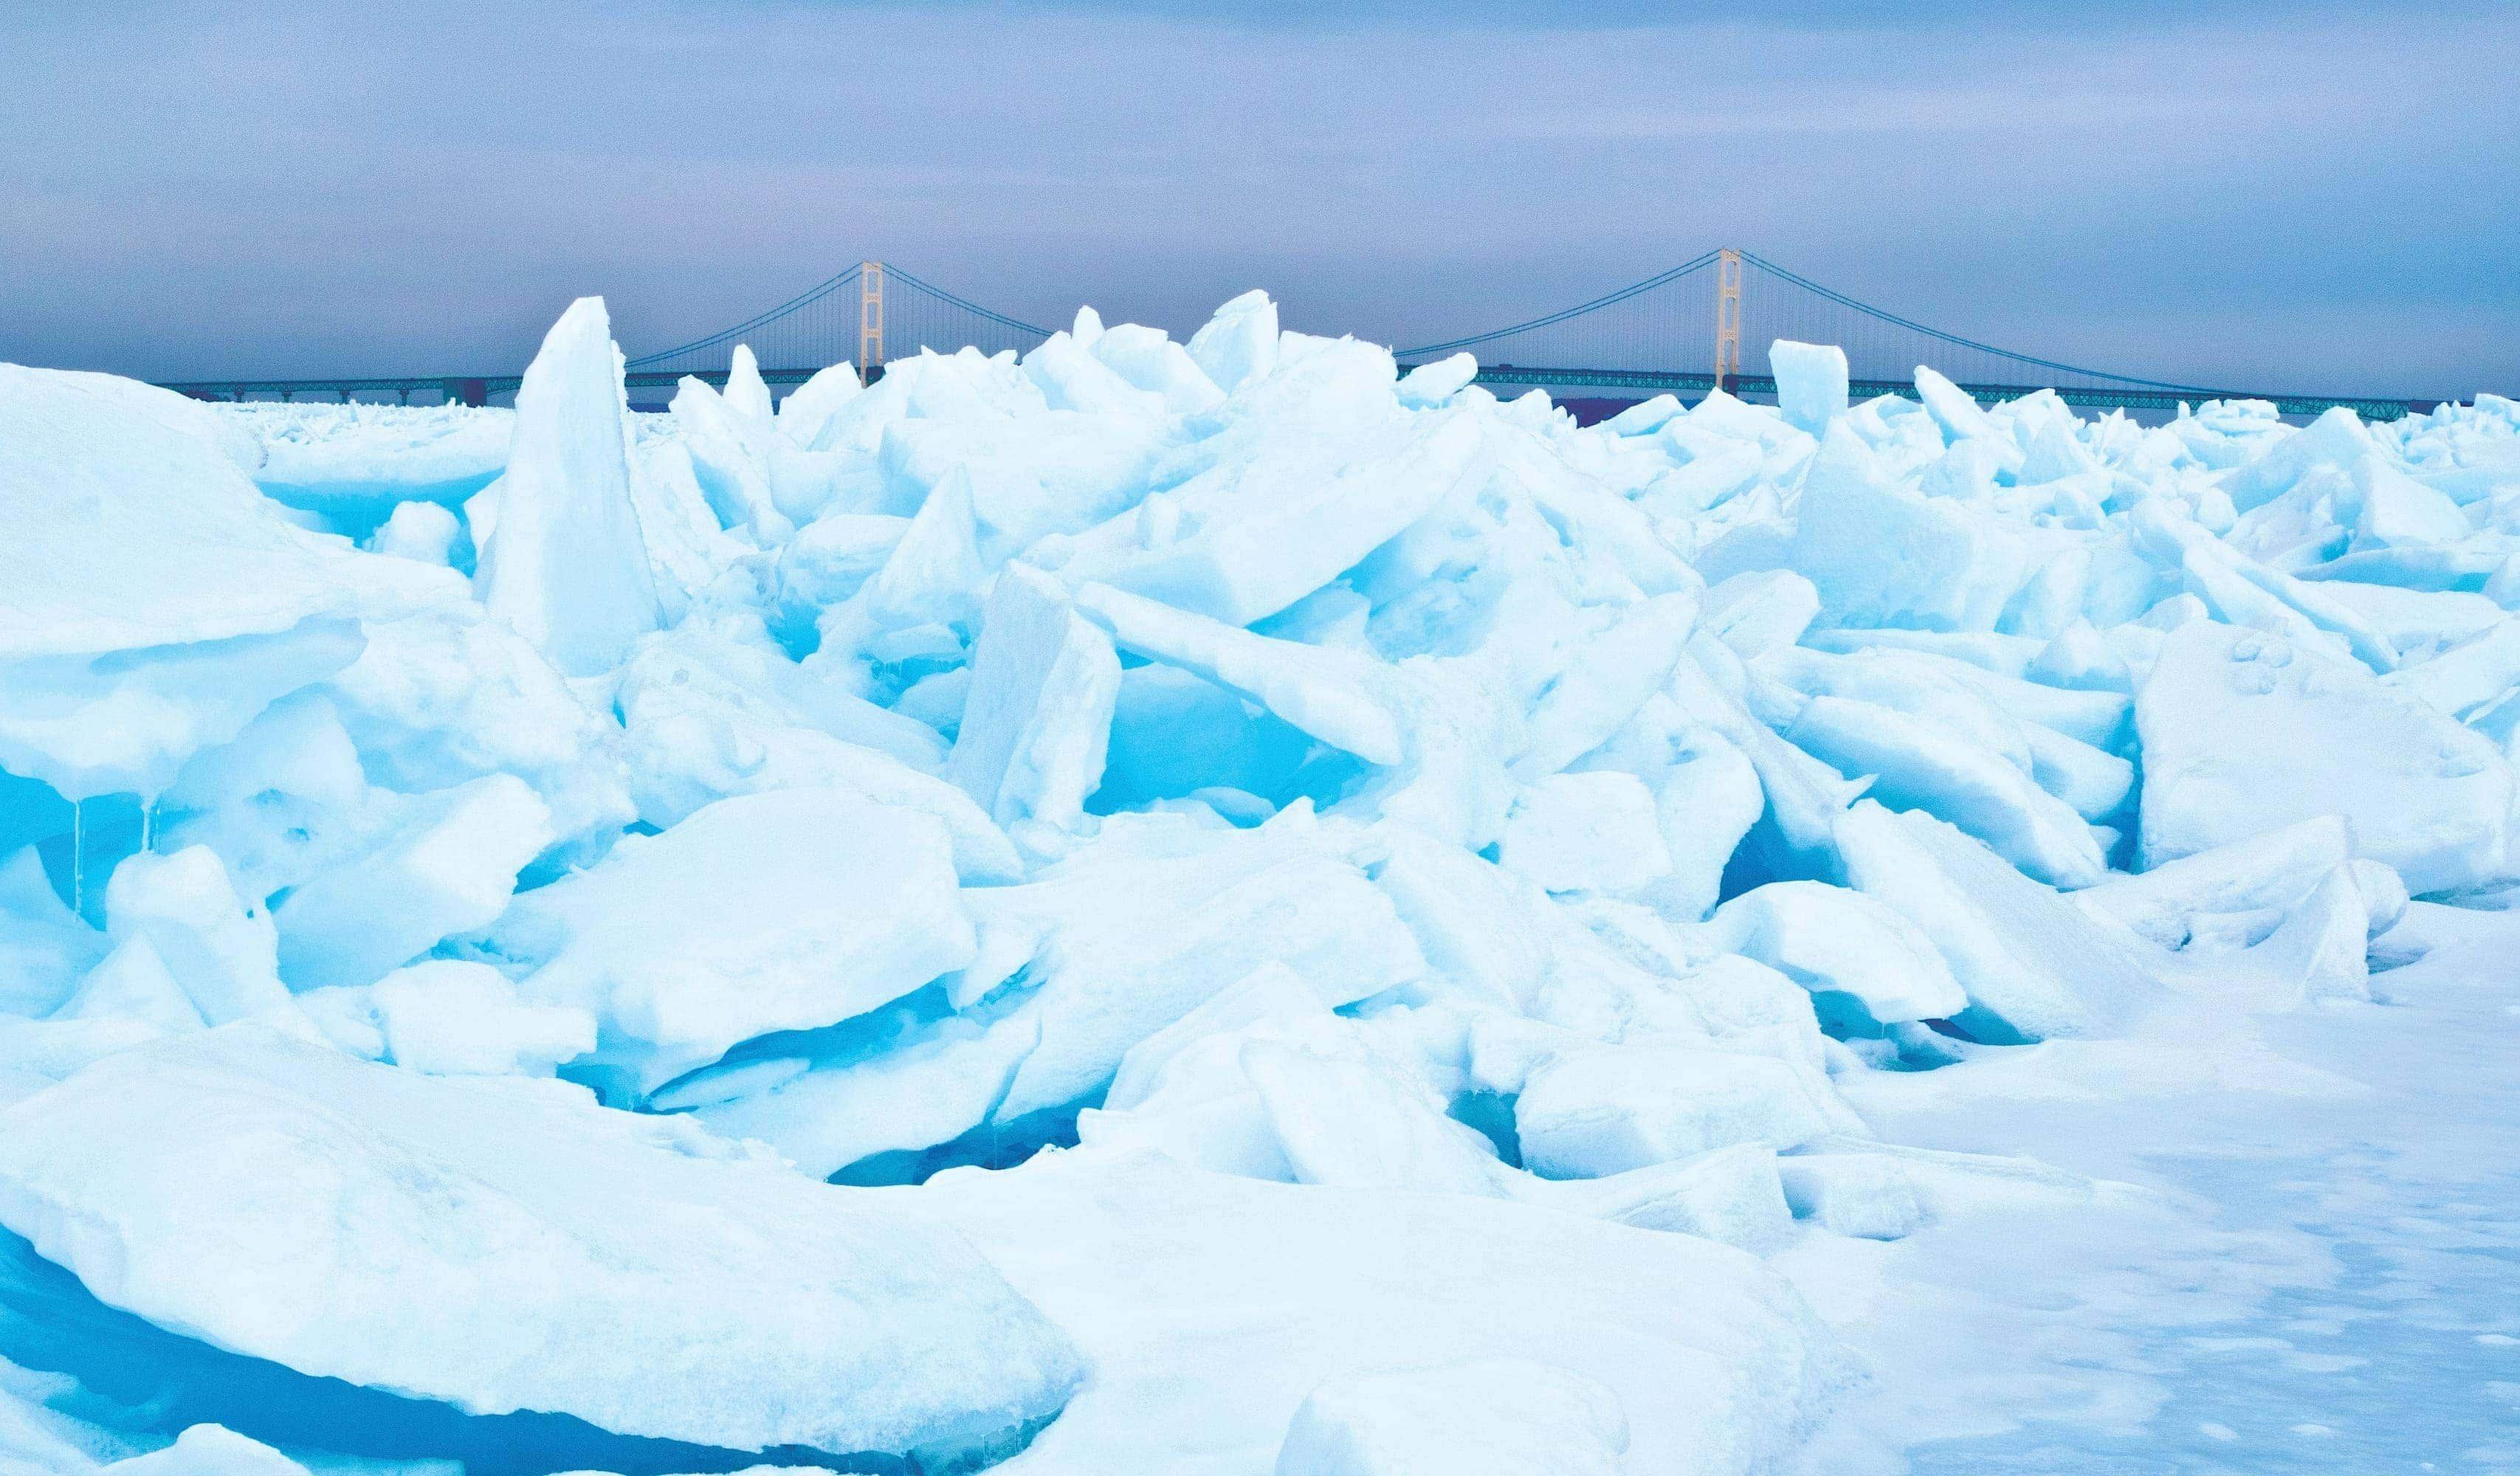 mackinac bridge and ice